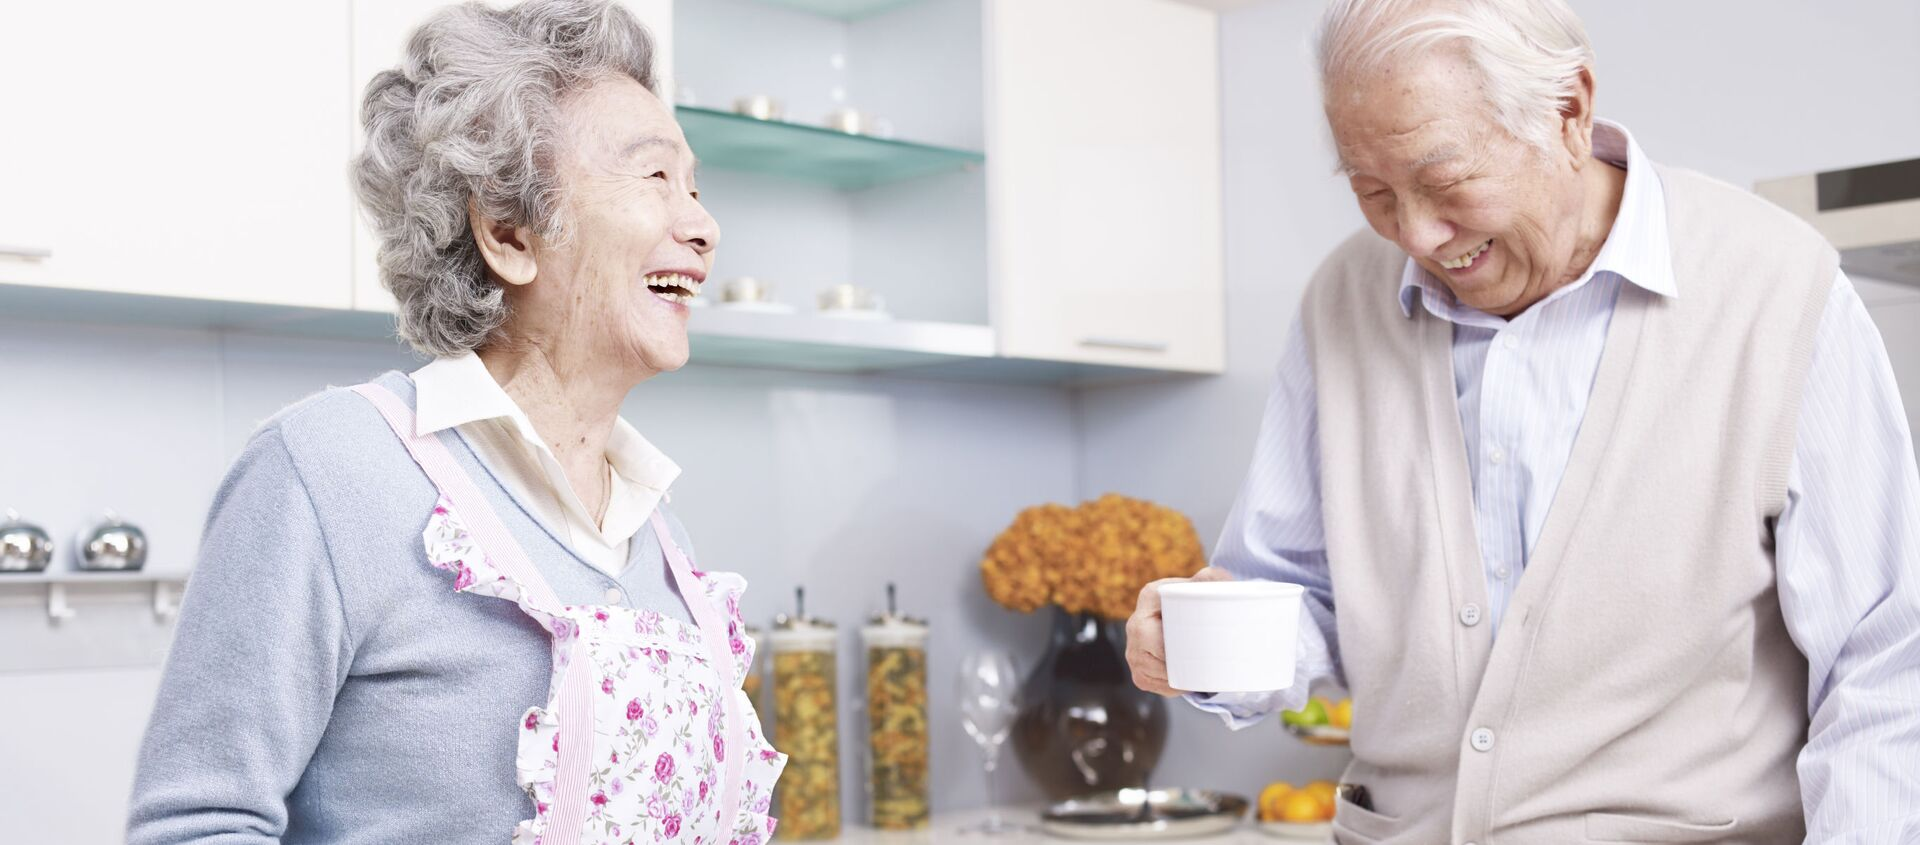 Cặp đôi lớn tuổi - Sputnik Việt Nam, 1920, 13.12.2020